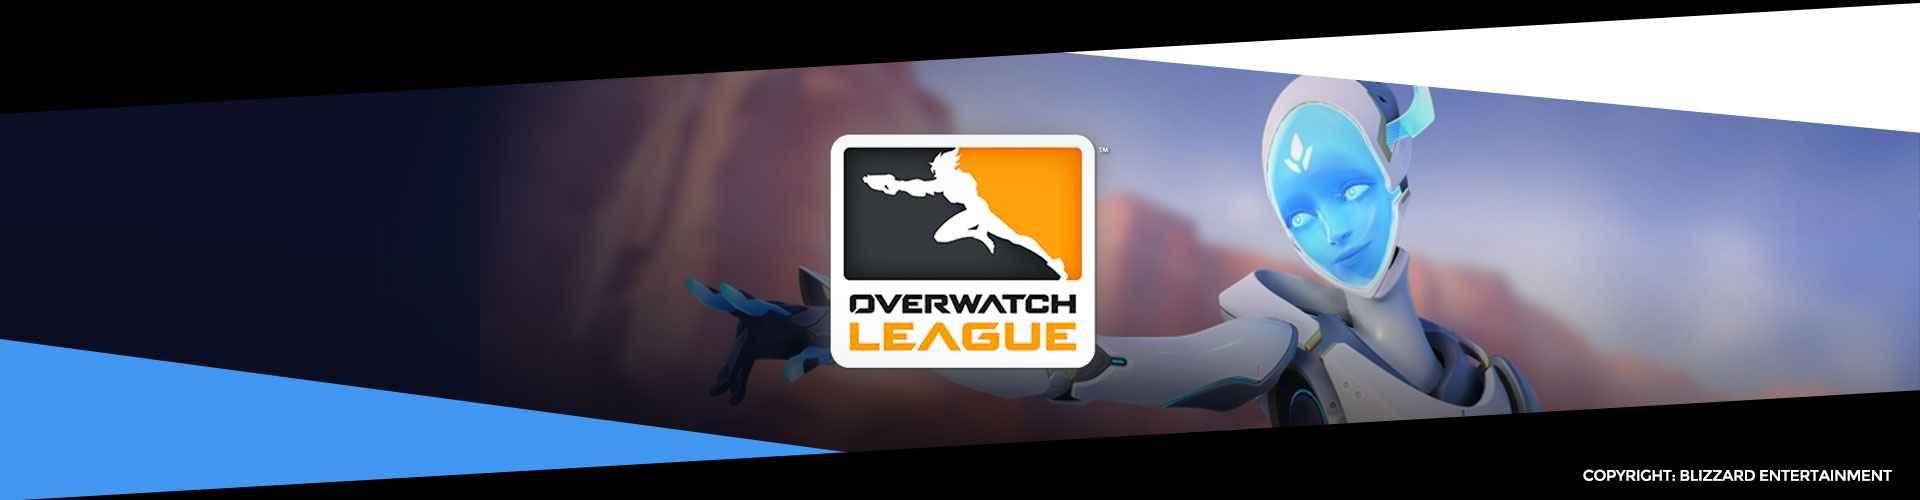 Overwatch League 2020 Mid Season Update